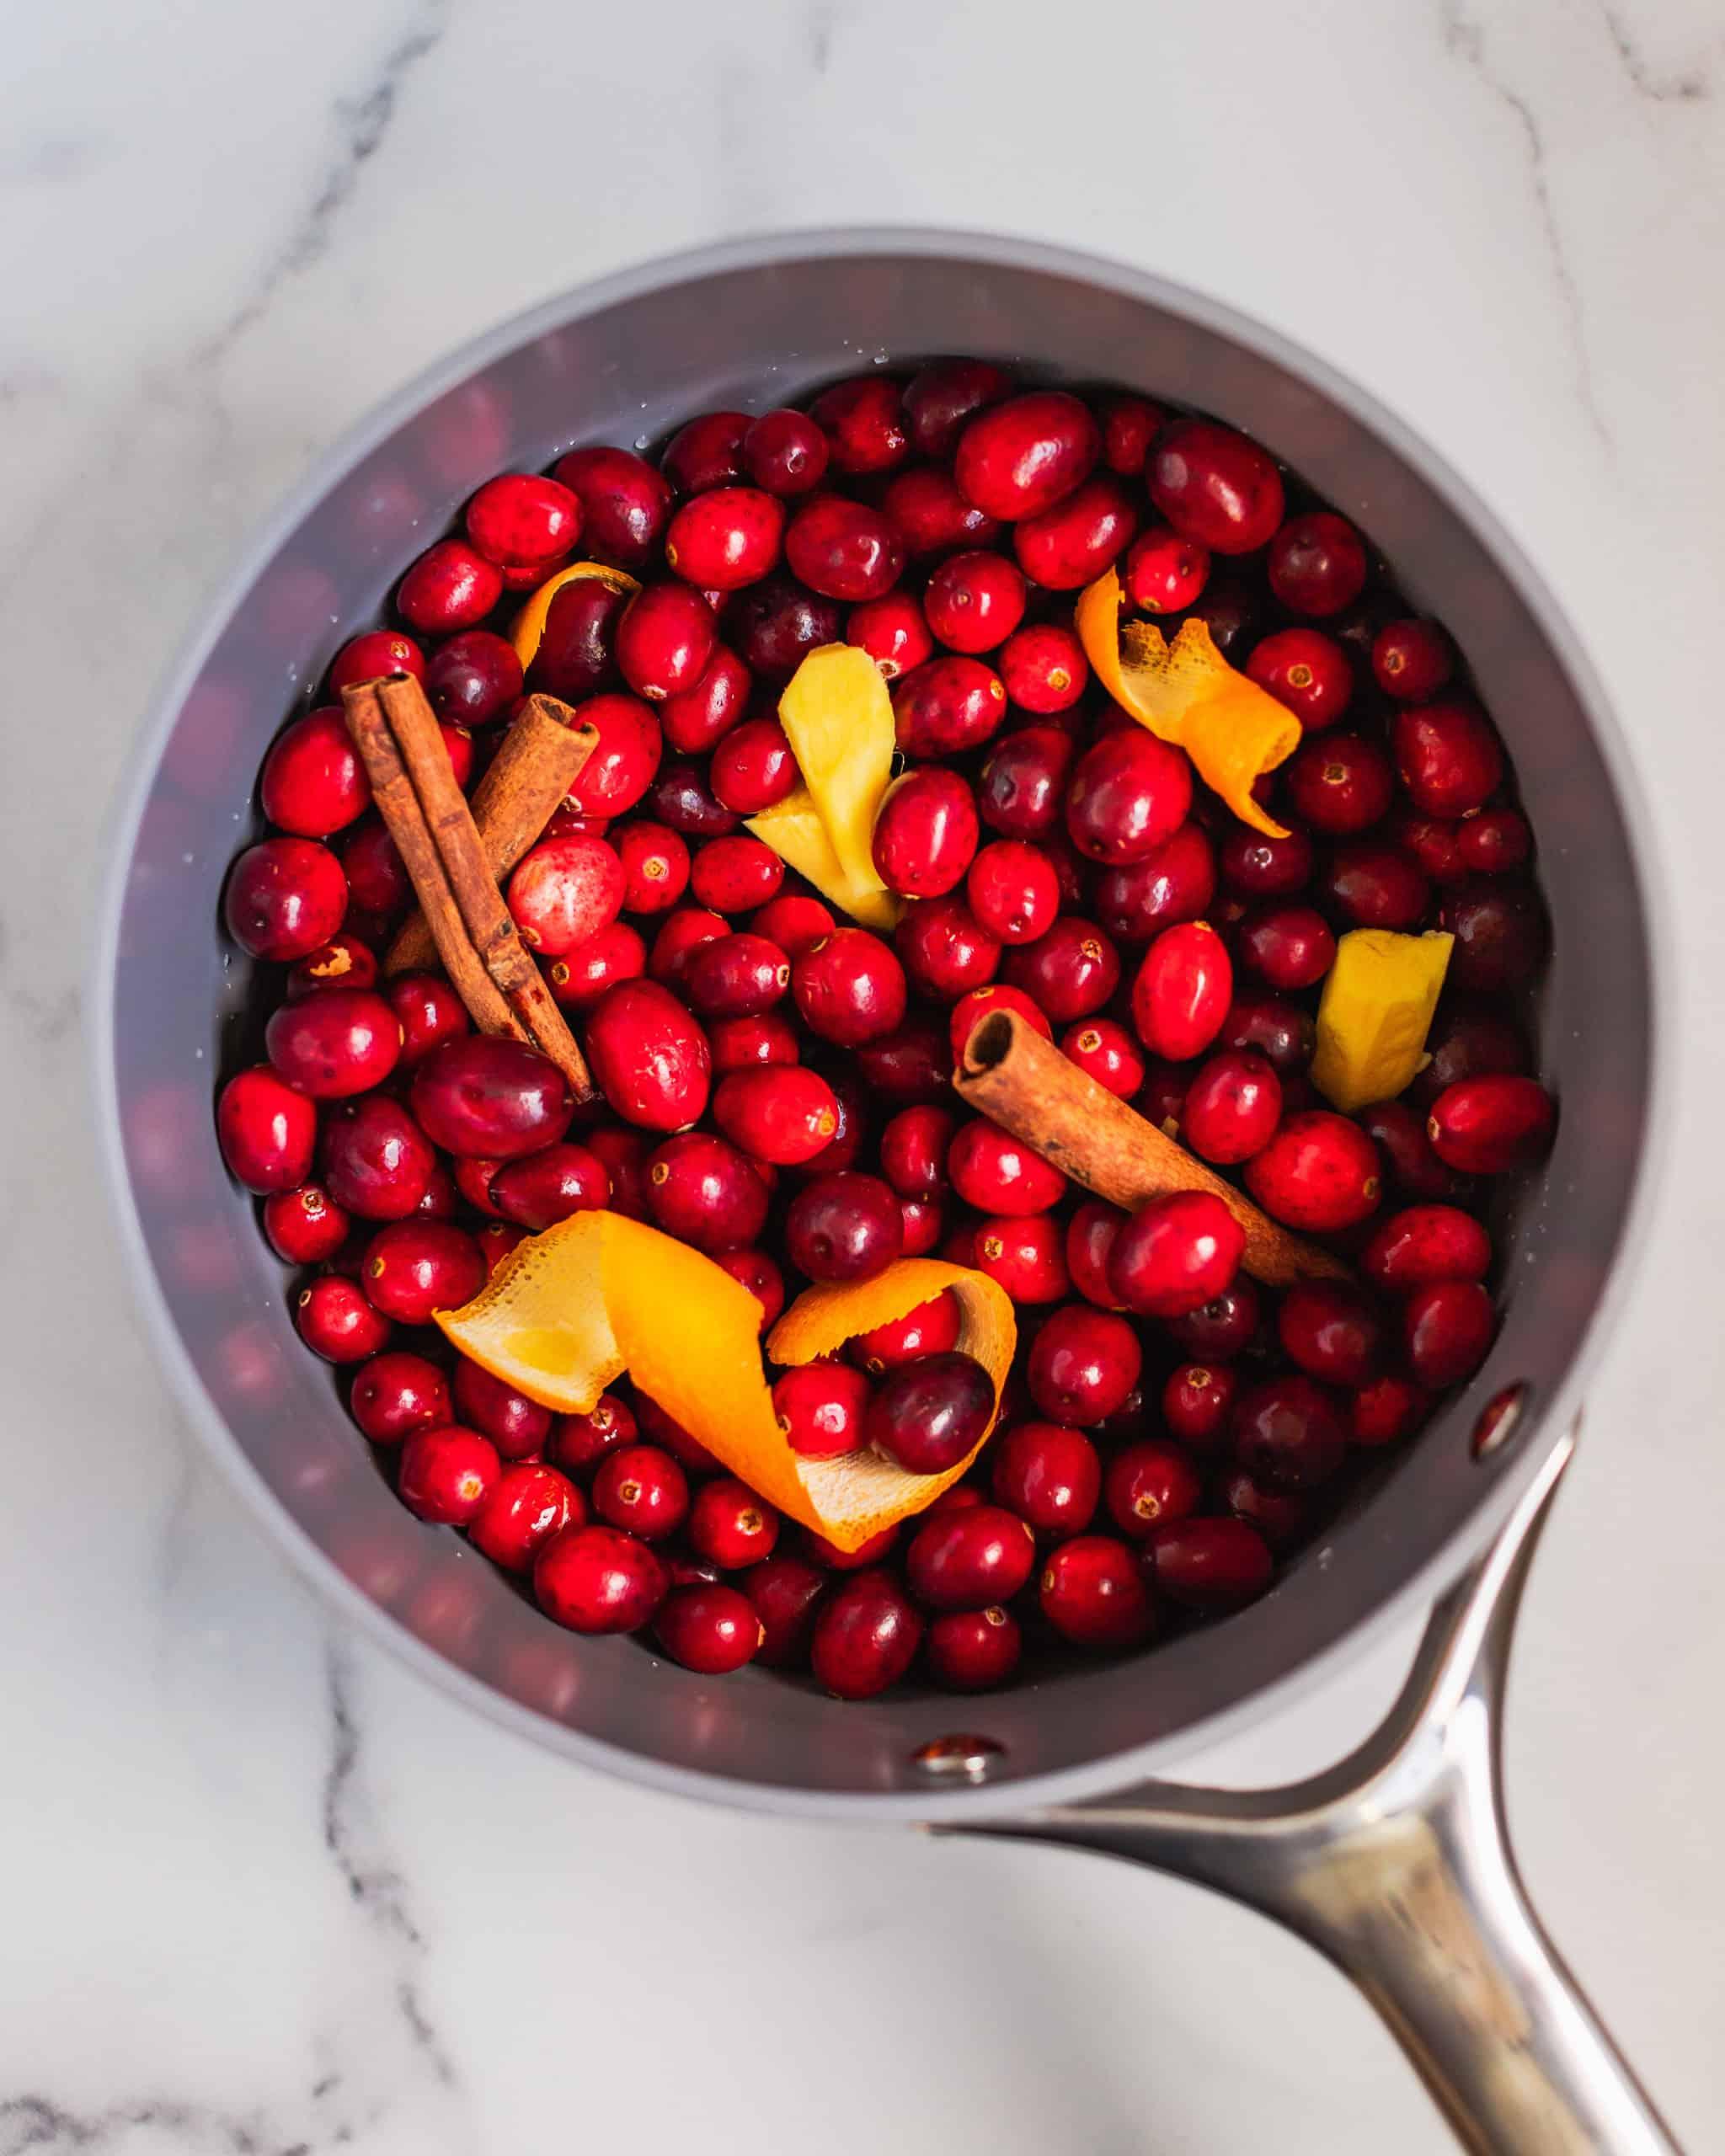 cranberries with cinnamon and orange zest